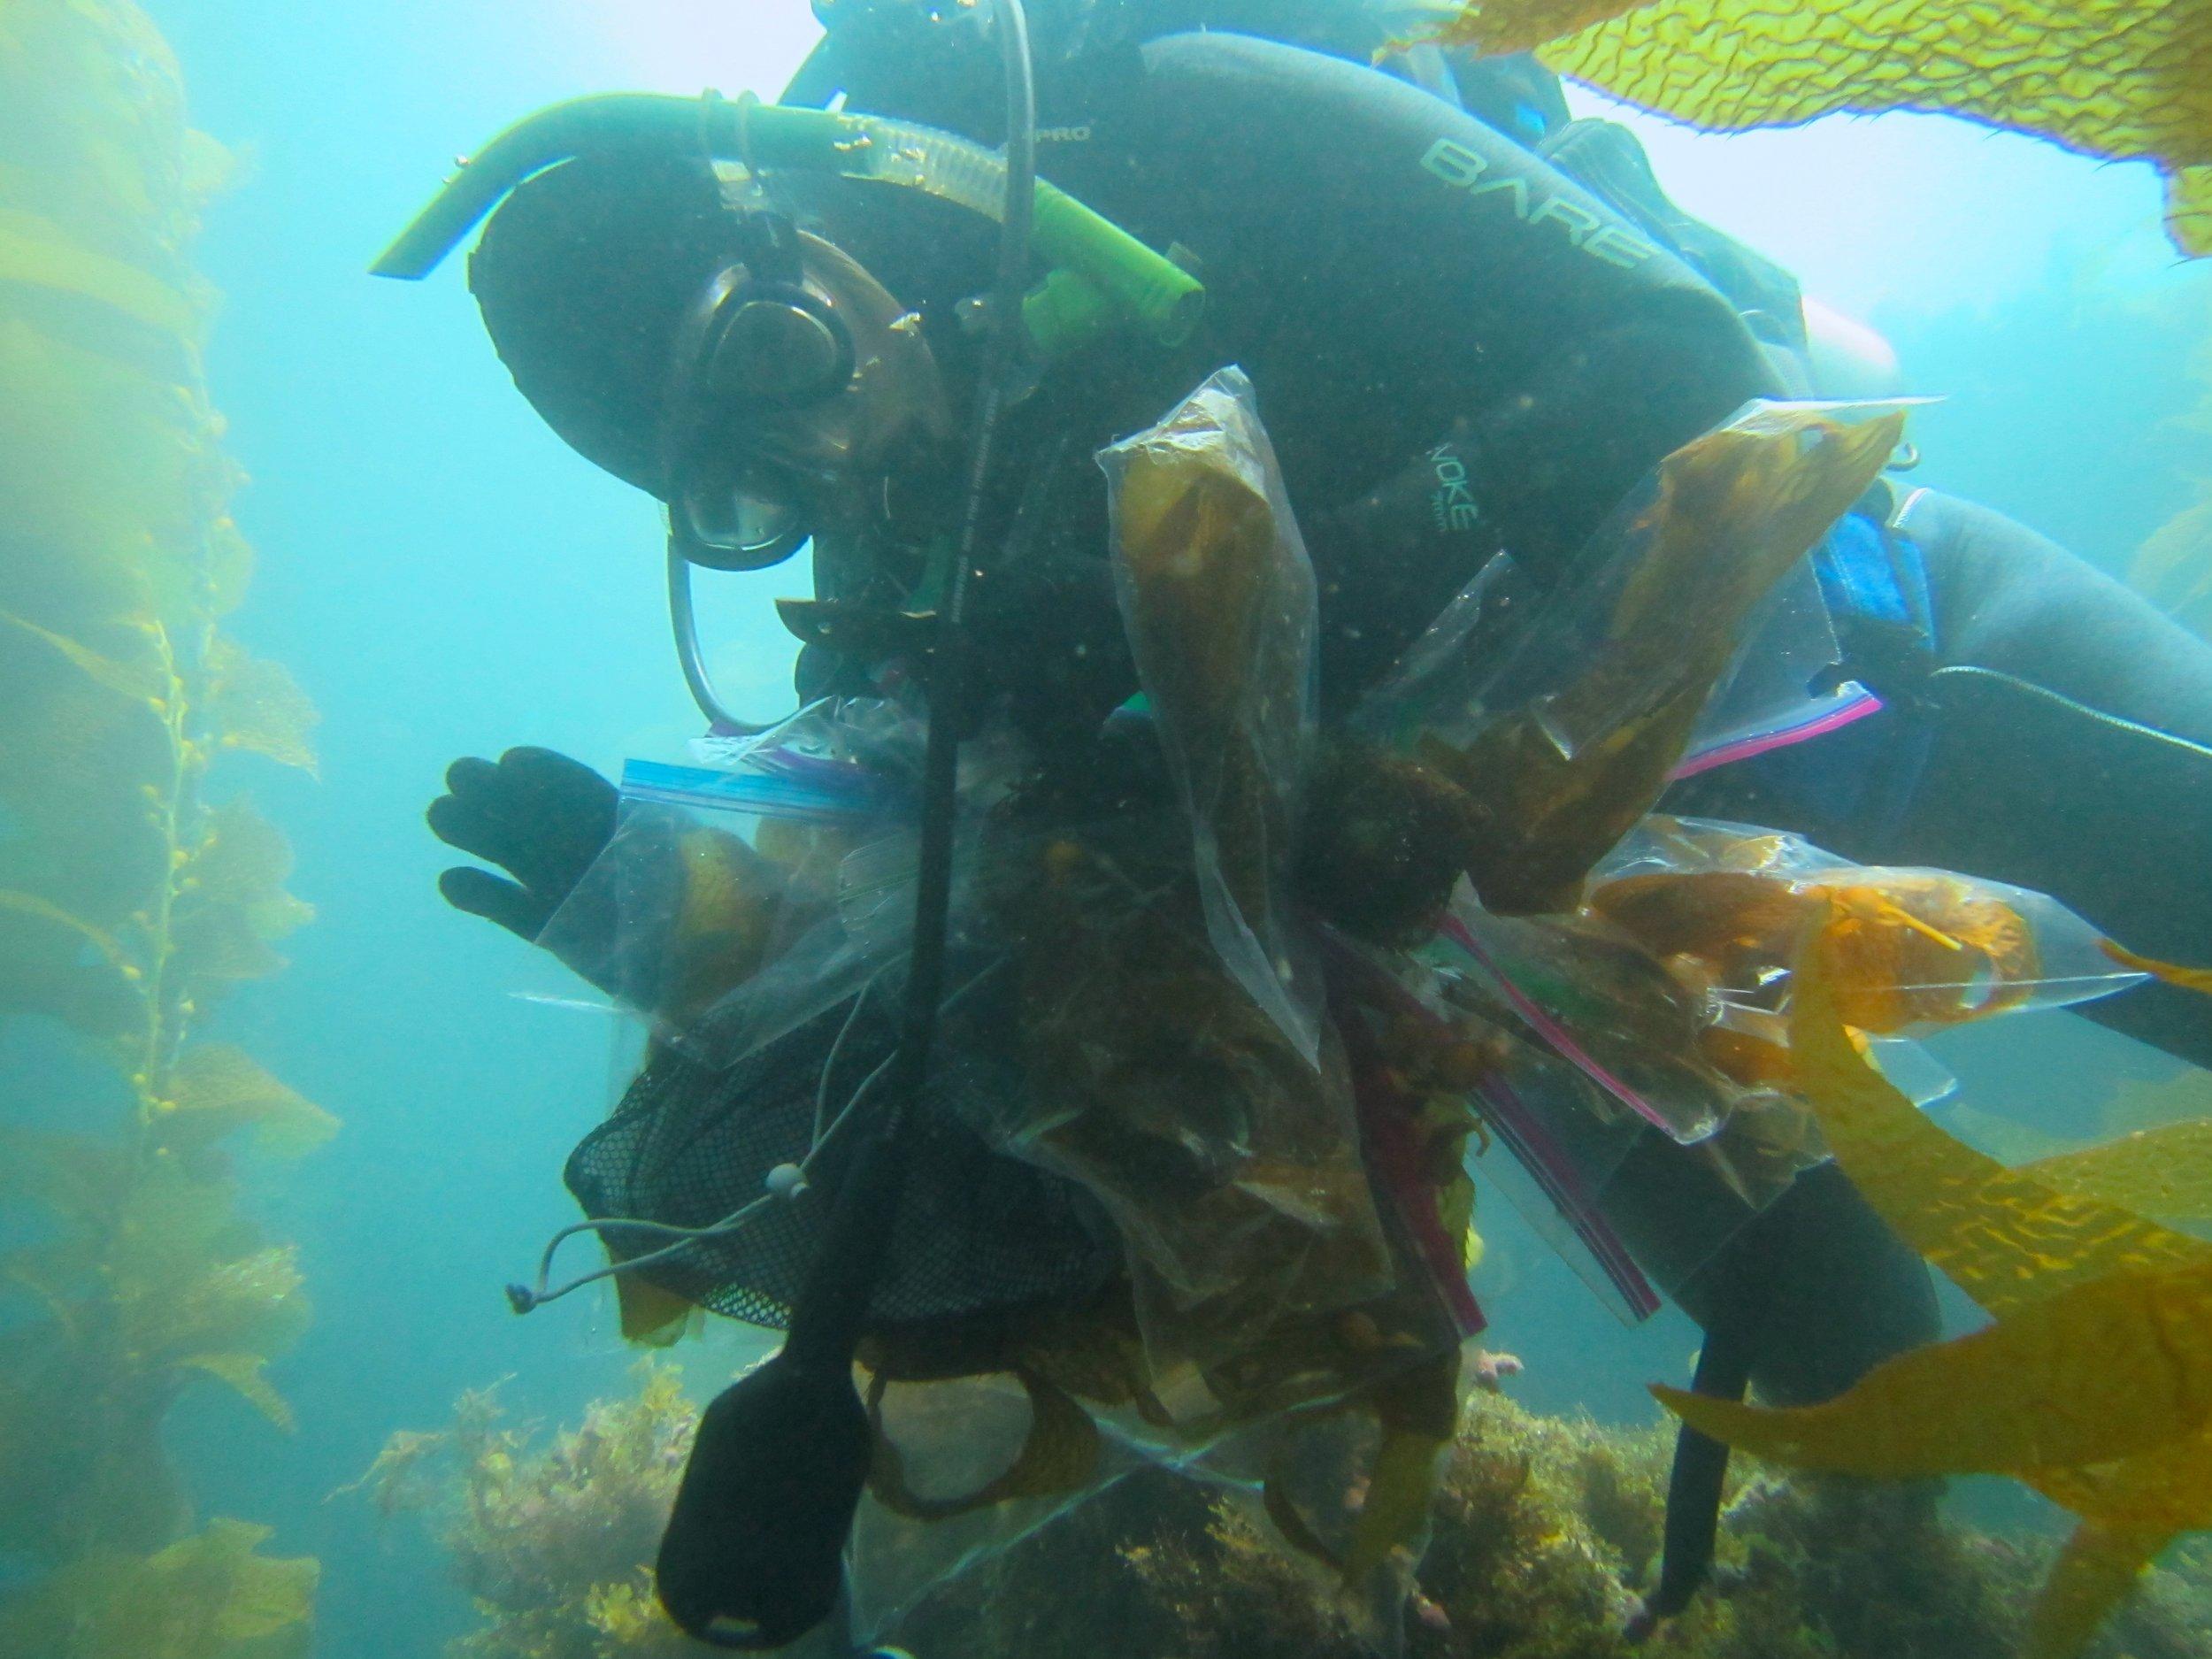 Dr. Elizabeth Dinsdale collecting kelp and  Sargassum  samples for later analysis. Photo credit: Jason Baer